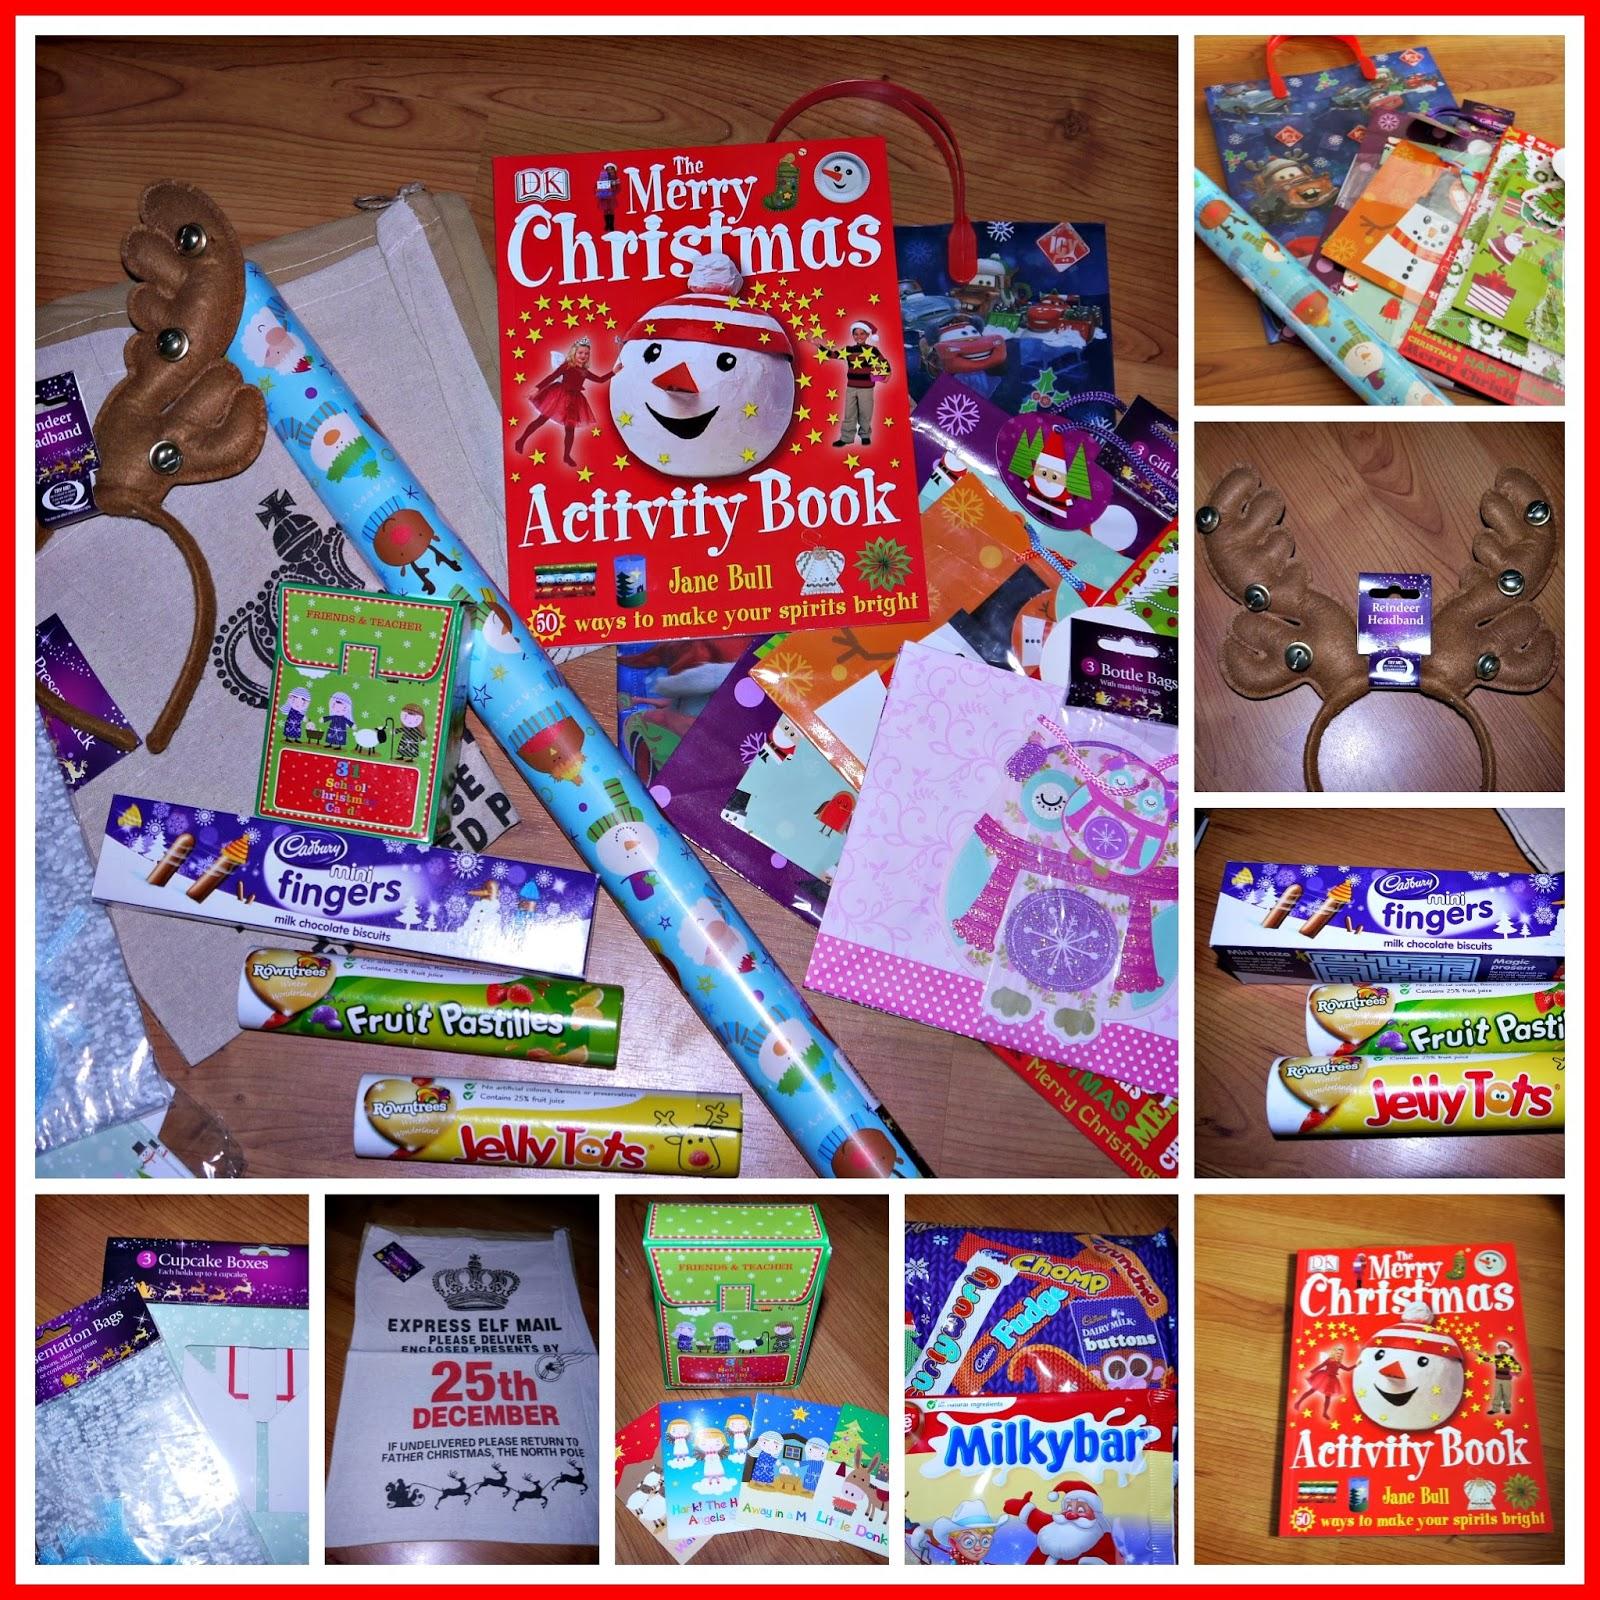 Inside The Wendy House: Christmas At Poundland